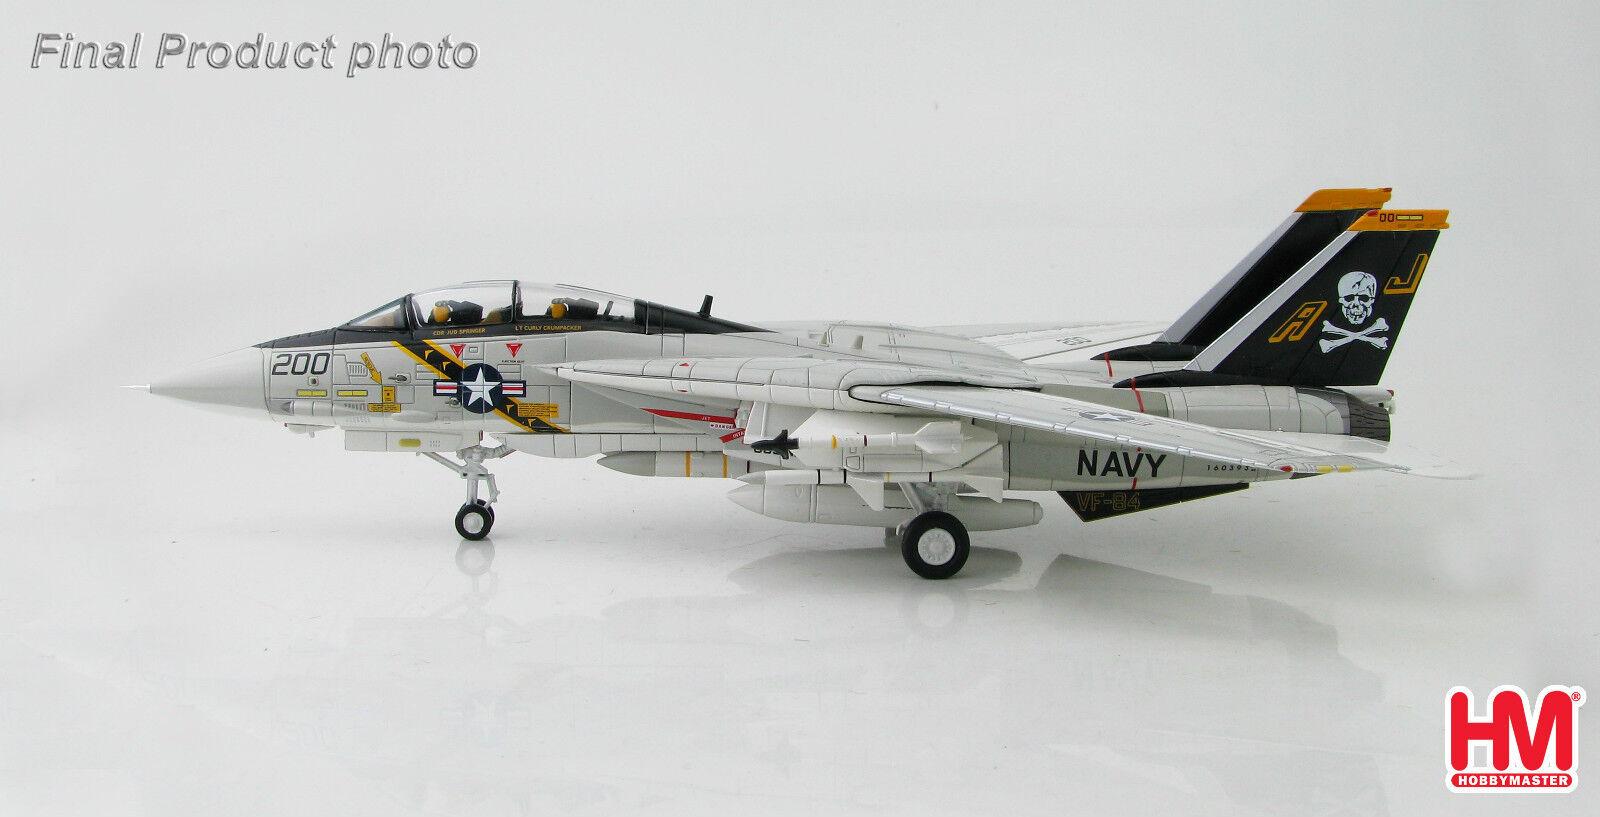 Hobbymaster 1:72 HA5203 F-14A Tomcat AJ200 VF-84 Jolly Rogers US Navy 2018 MIB